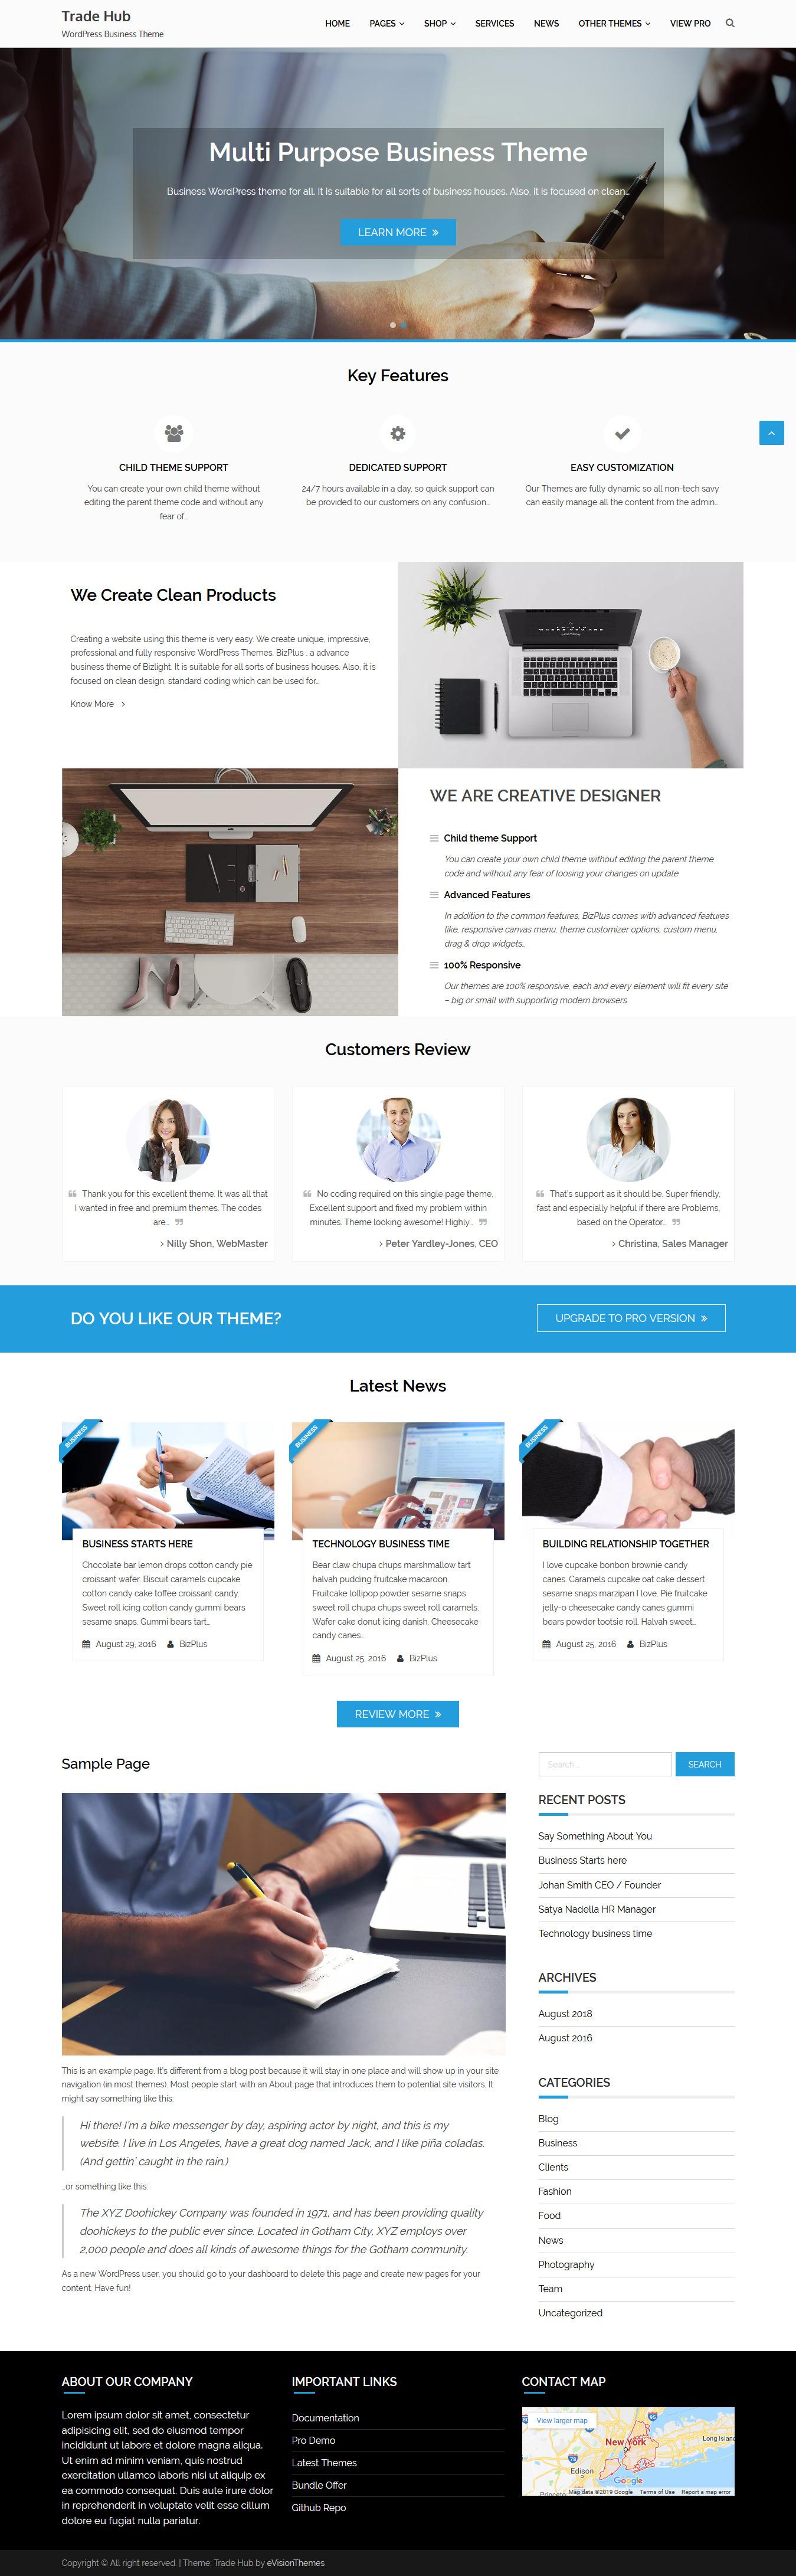 trade hub best free accounting wordpress theme - 10+ Best Free Accounting WordPress Themes